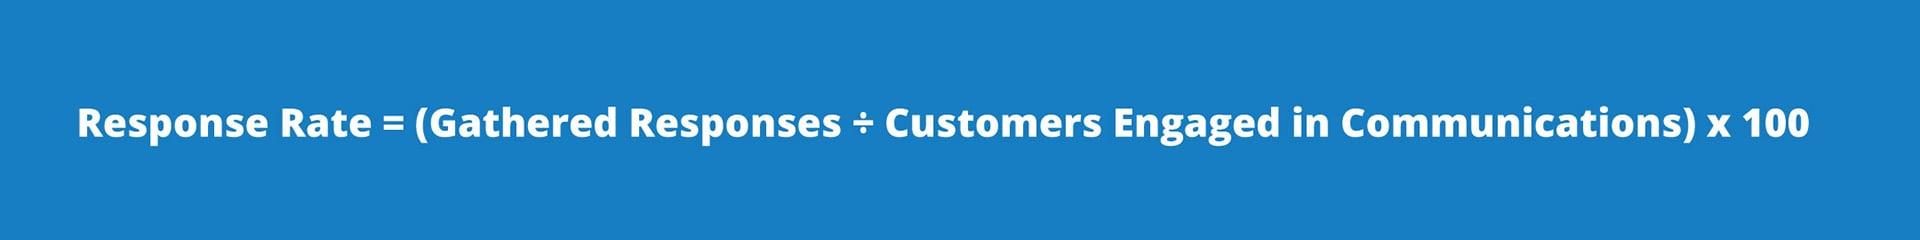 Email response rate formula